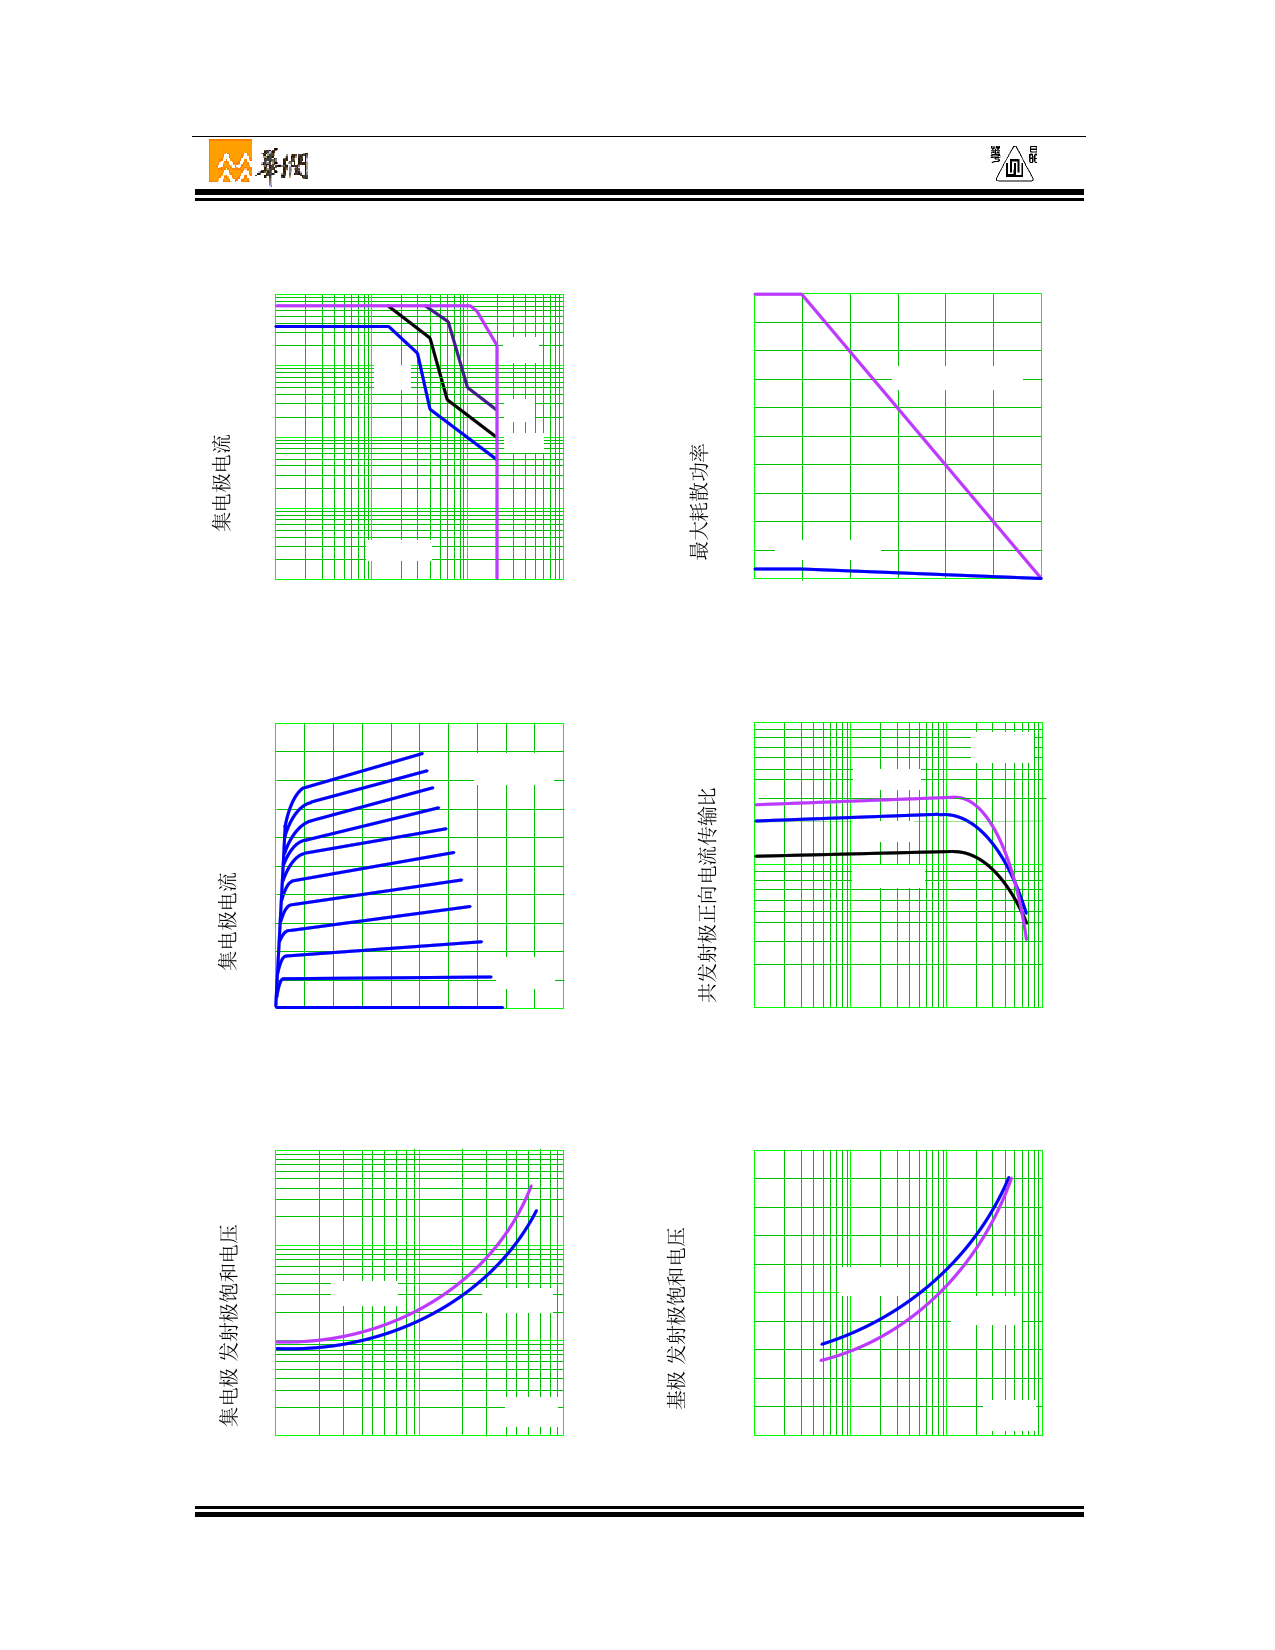 3DD128FH5D pdf, ピン配列